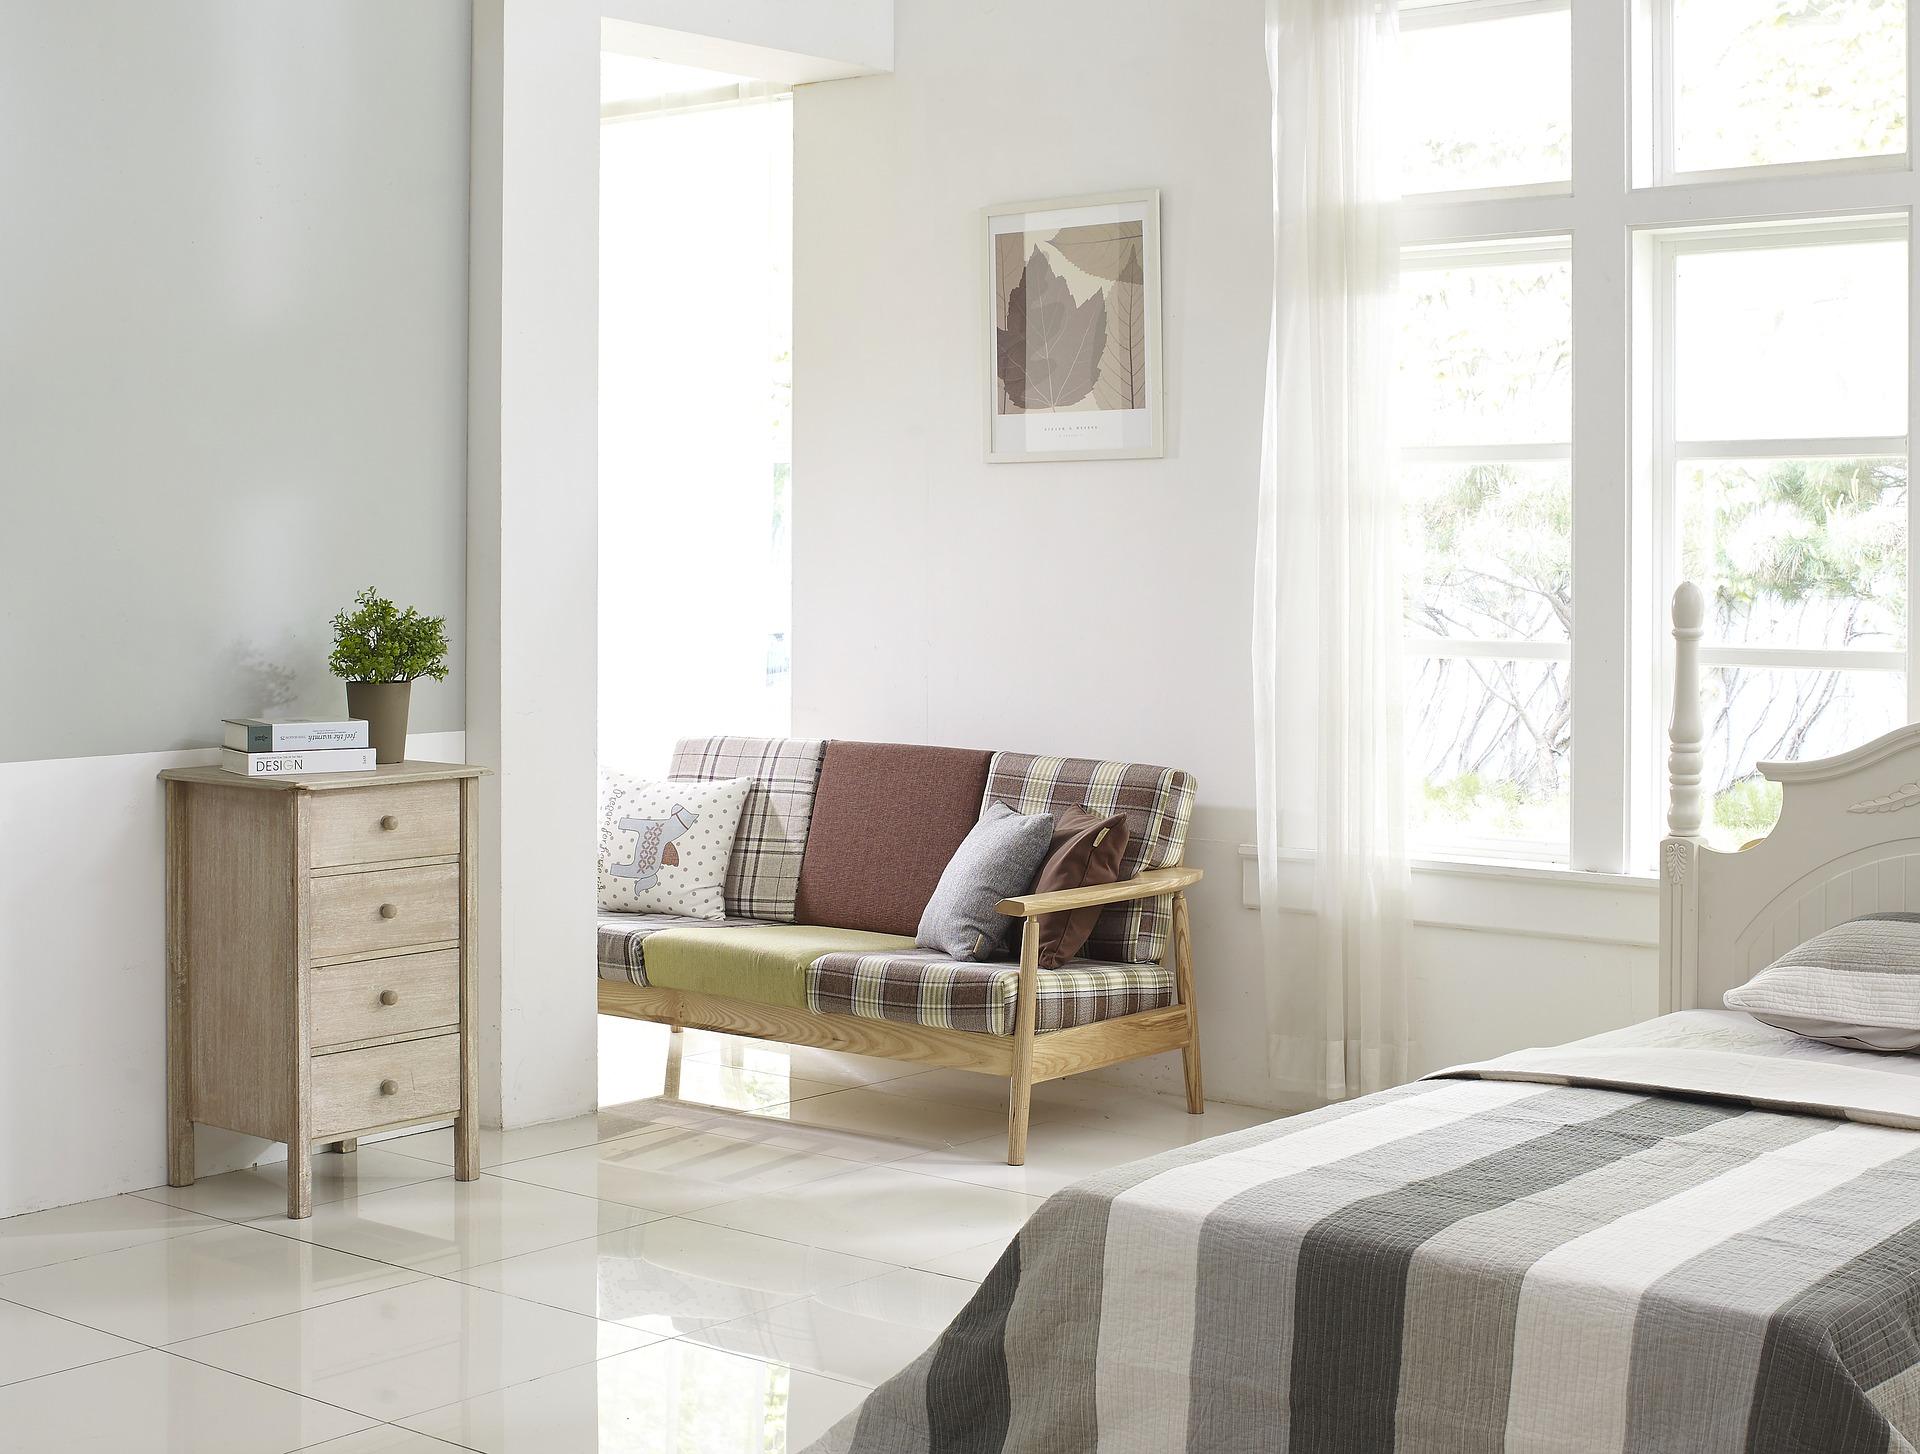 bedroom-1872196_1920.jpg